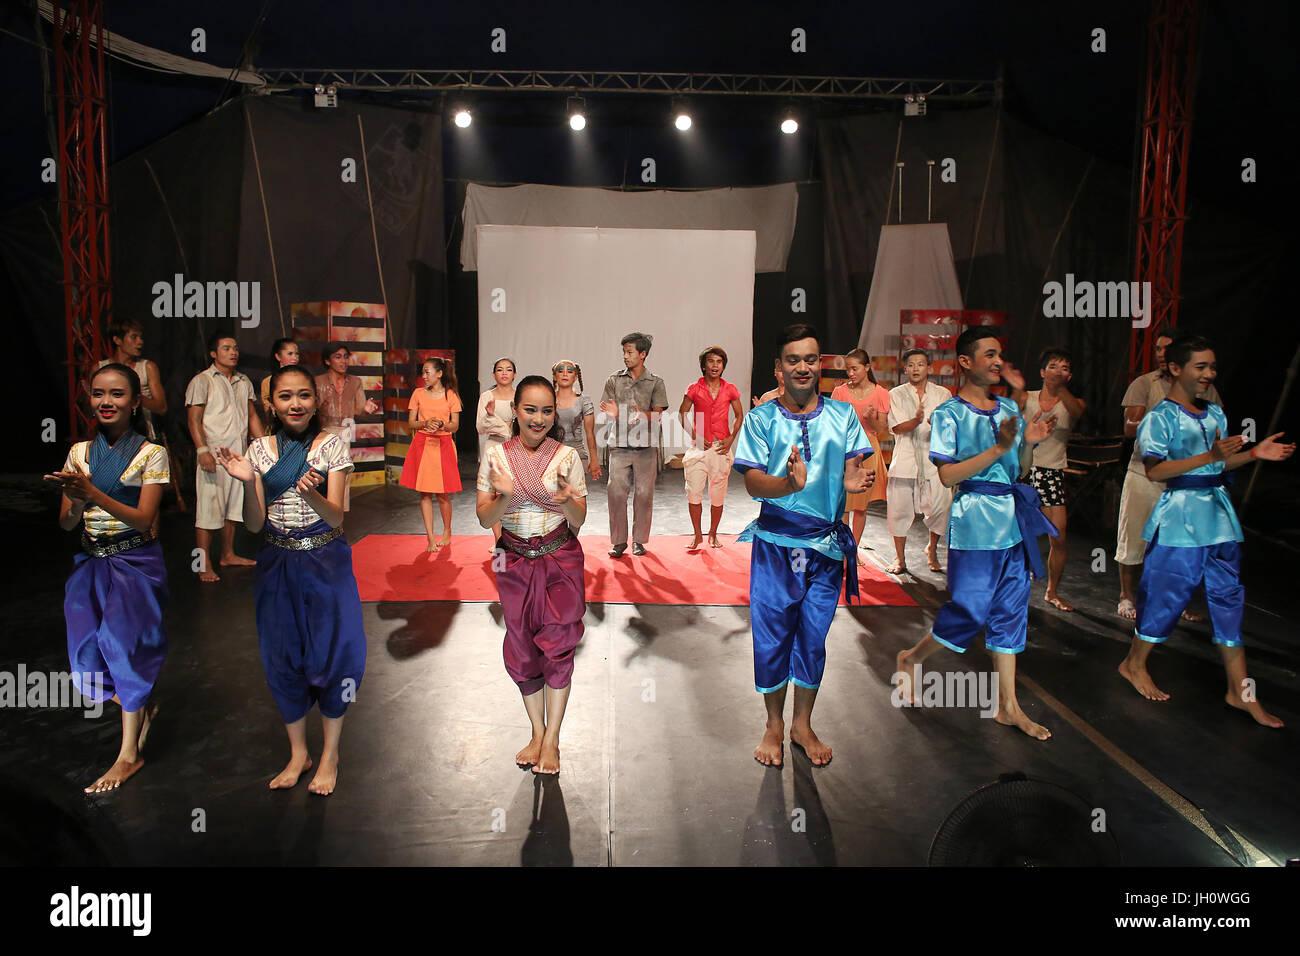 Phare Ponleu Selpak Influence show in Battambang. Cambodia. - Stock Image